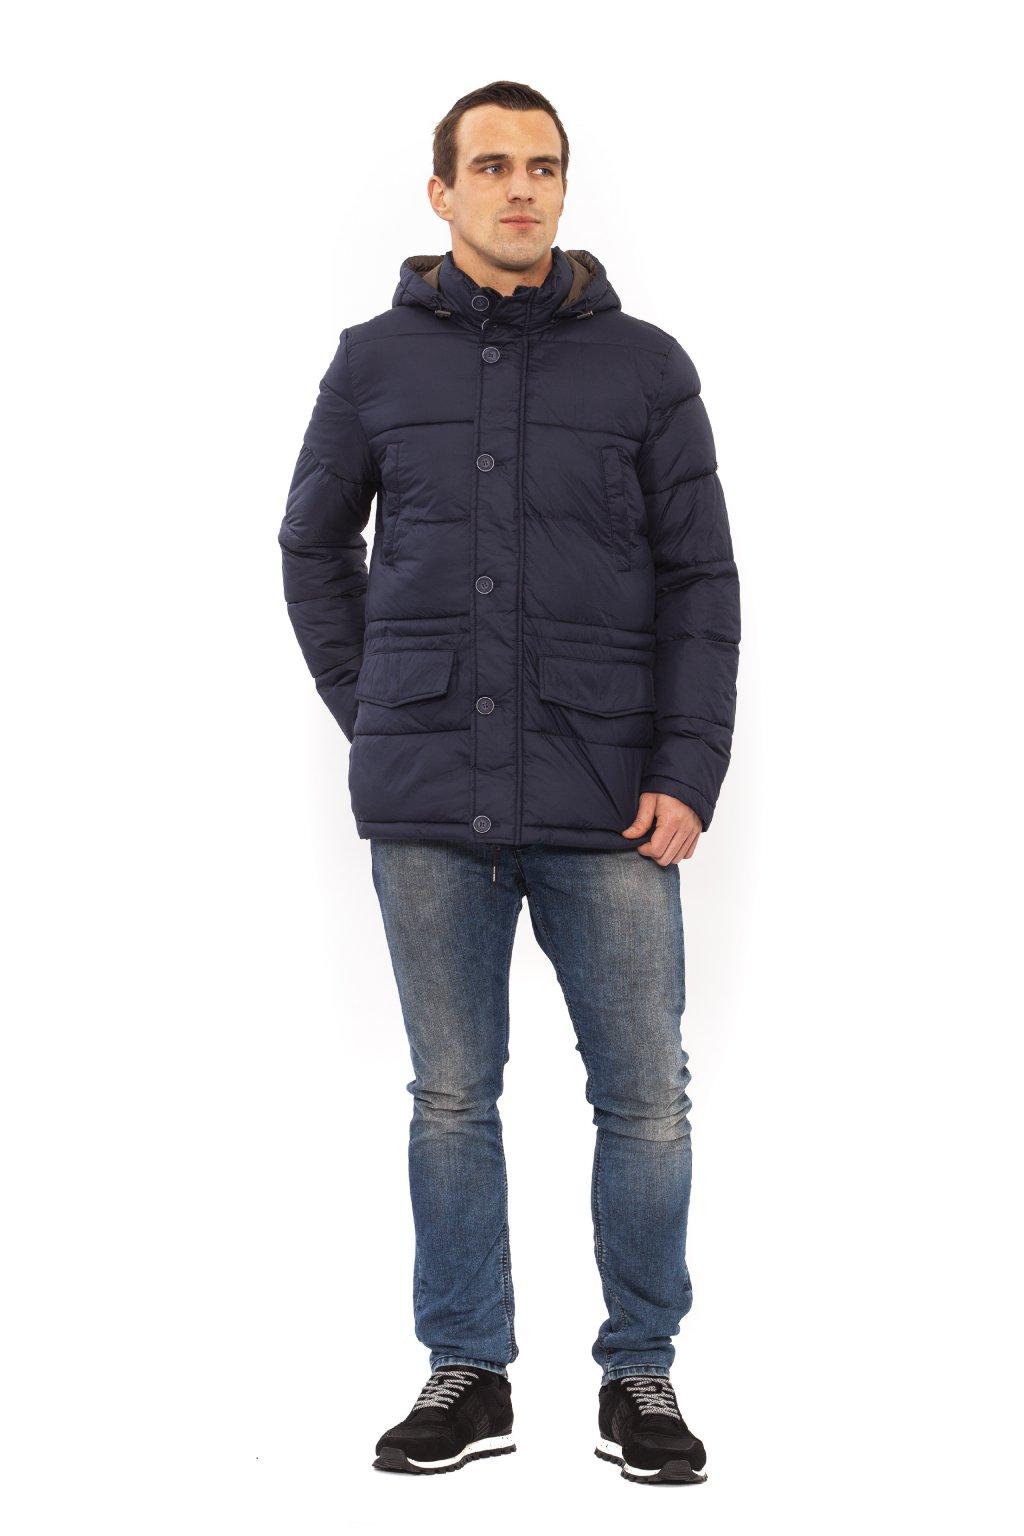 Pánská prošívaná bunda Trussardi - Modrá (Barva Modrá, Velikosti XL)